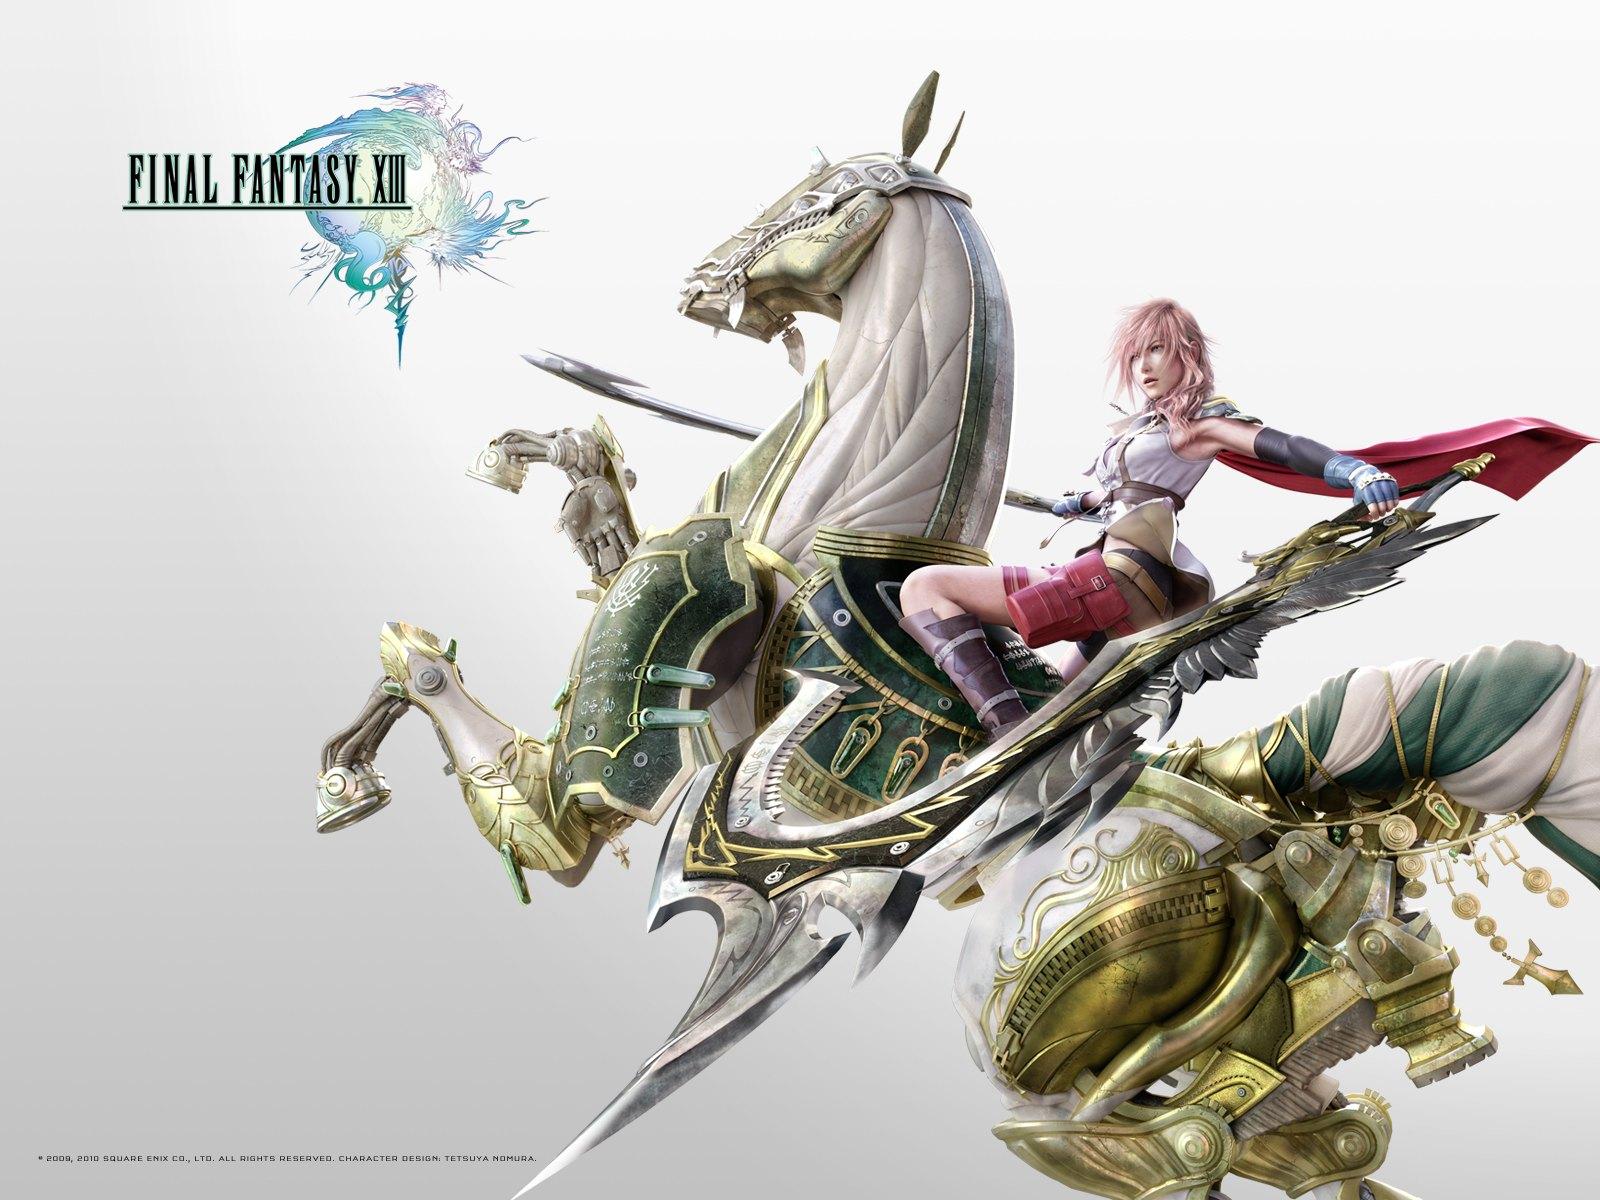 FF XIII Wallpaper   Final Fantasy XIII Wallpaper 32680106 1600x1200